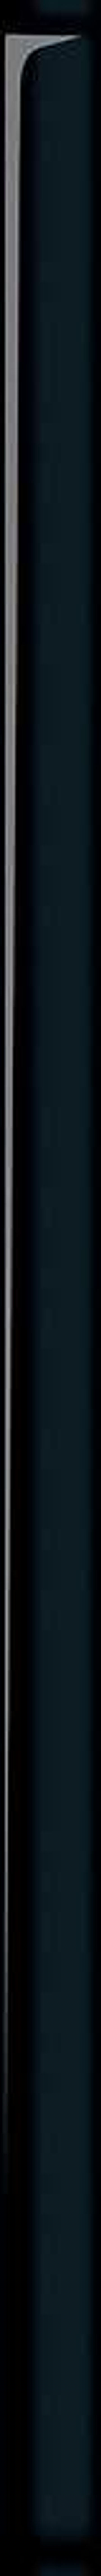 DEK BLACK BORDER 3X75